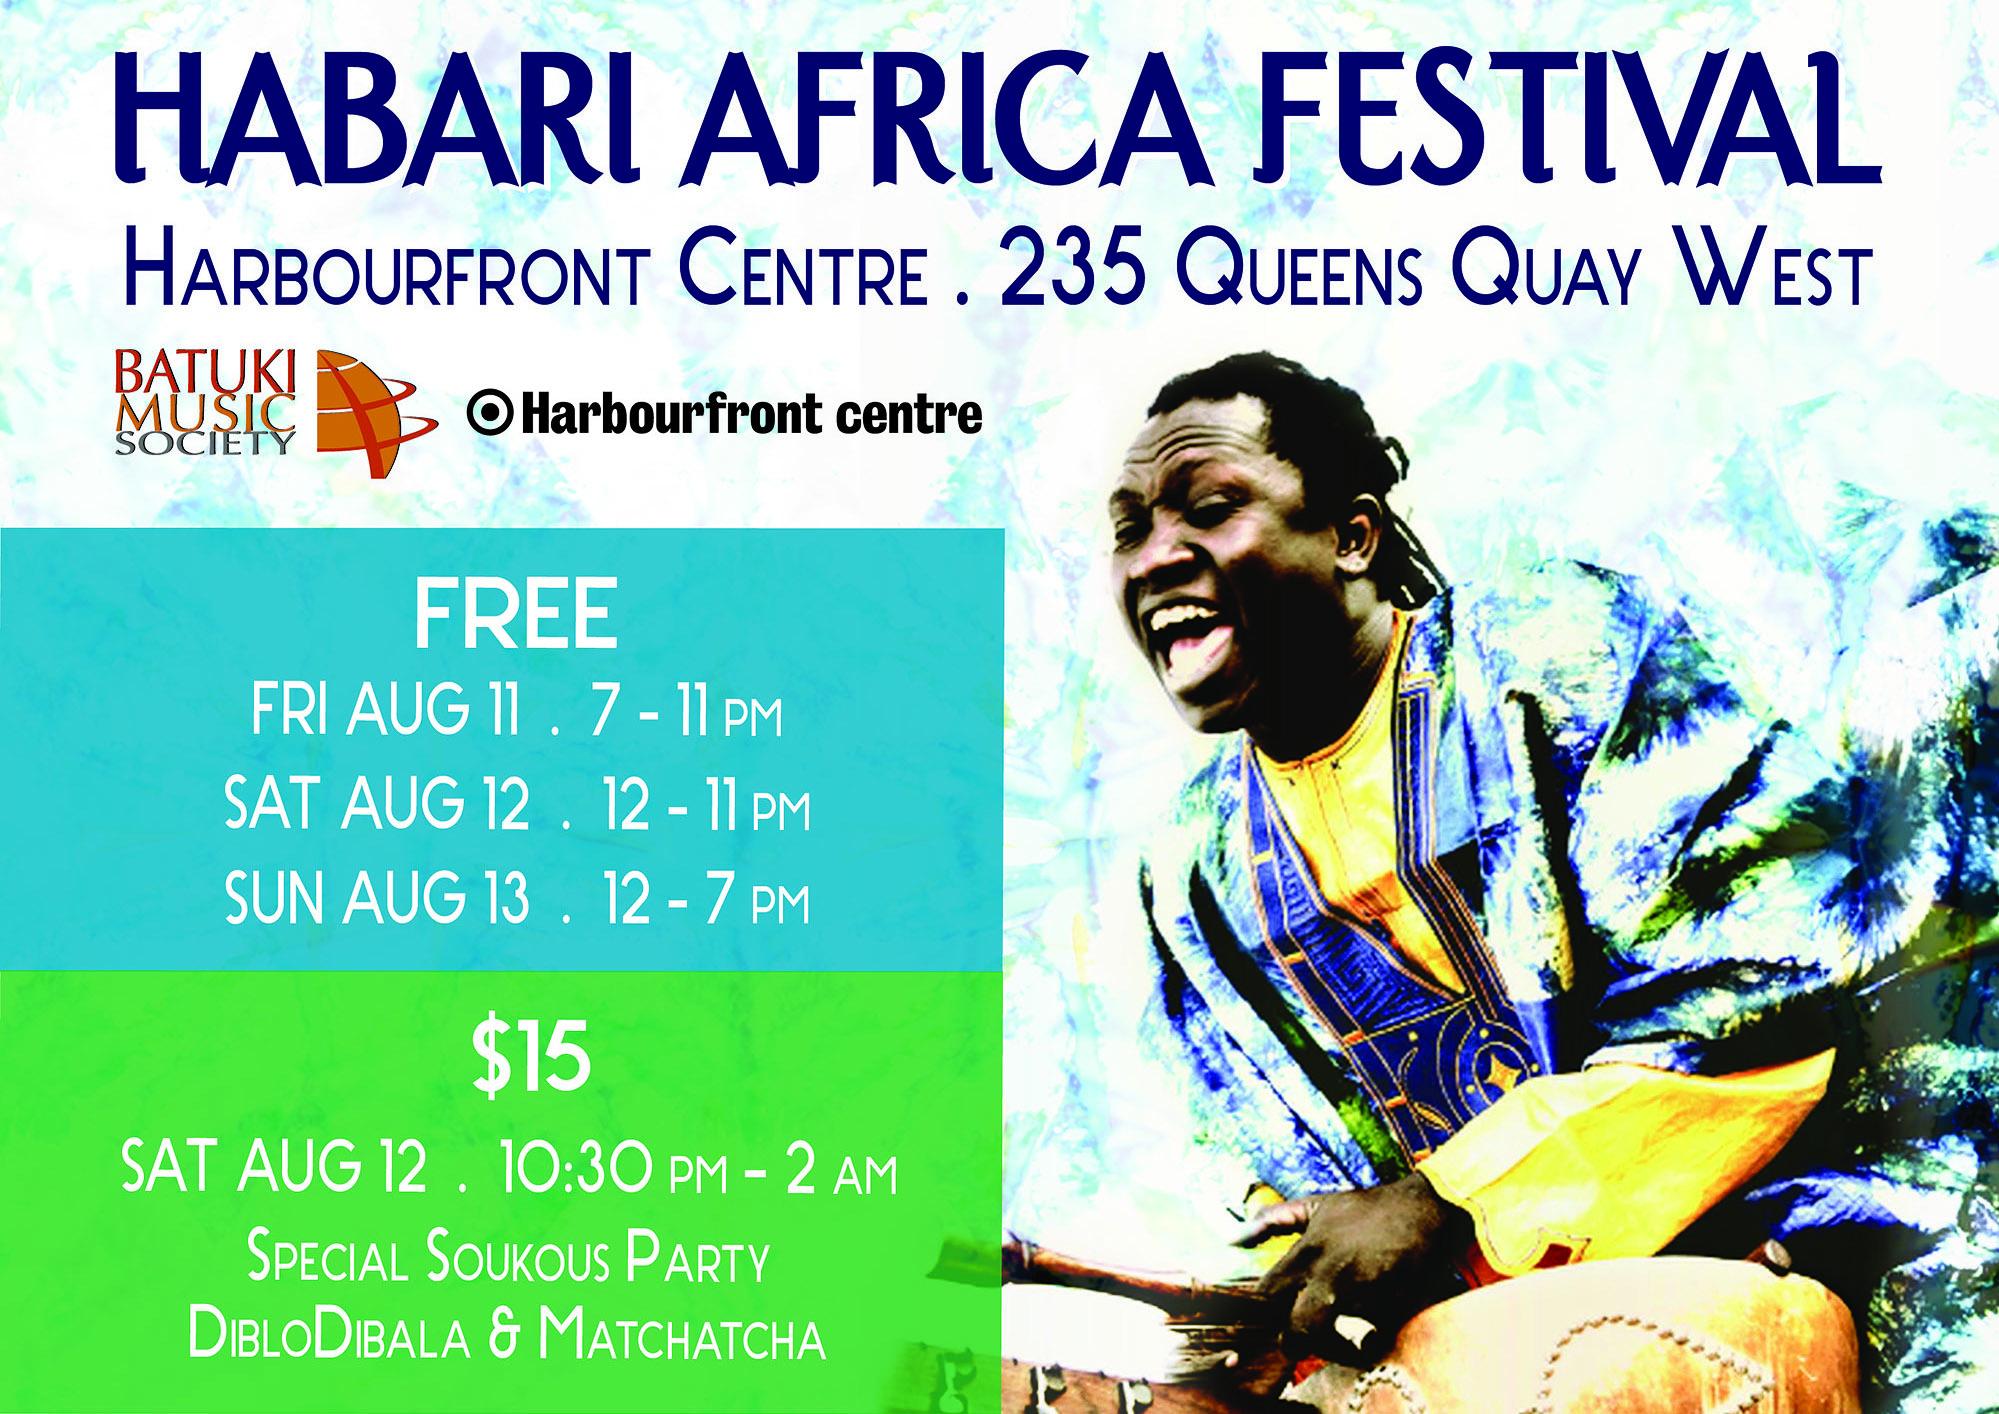 habari africa festival harbourfront centre batuki music society two ways to heaven screening movie ethiopian canadian toronto canada ethiopia